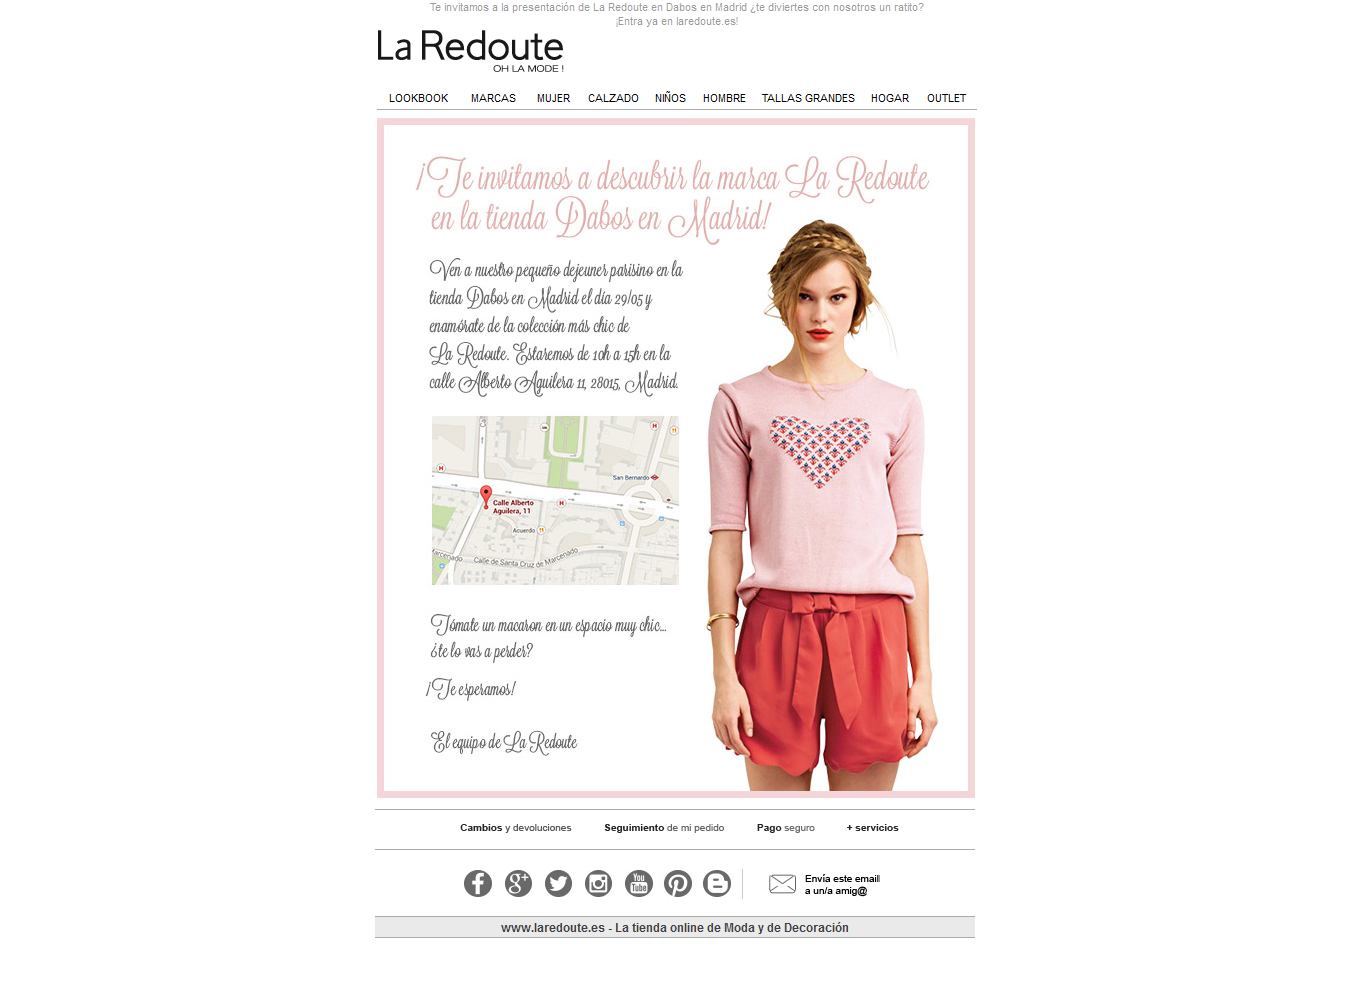 http://www.laredoute.es/?omniturecode=09110674886700001000011802es